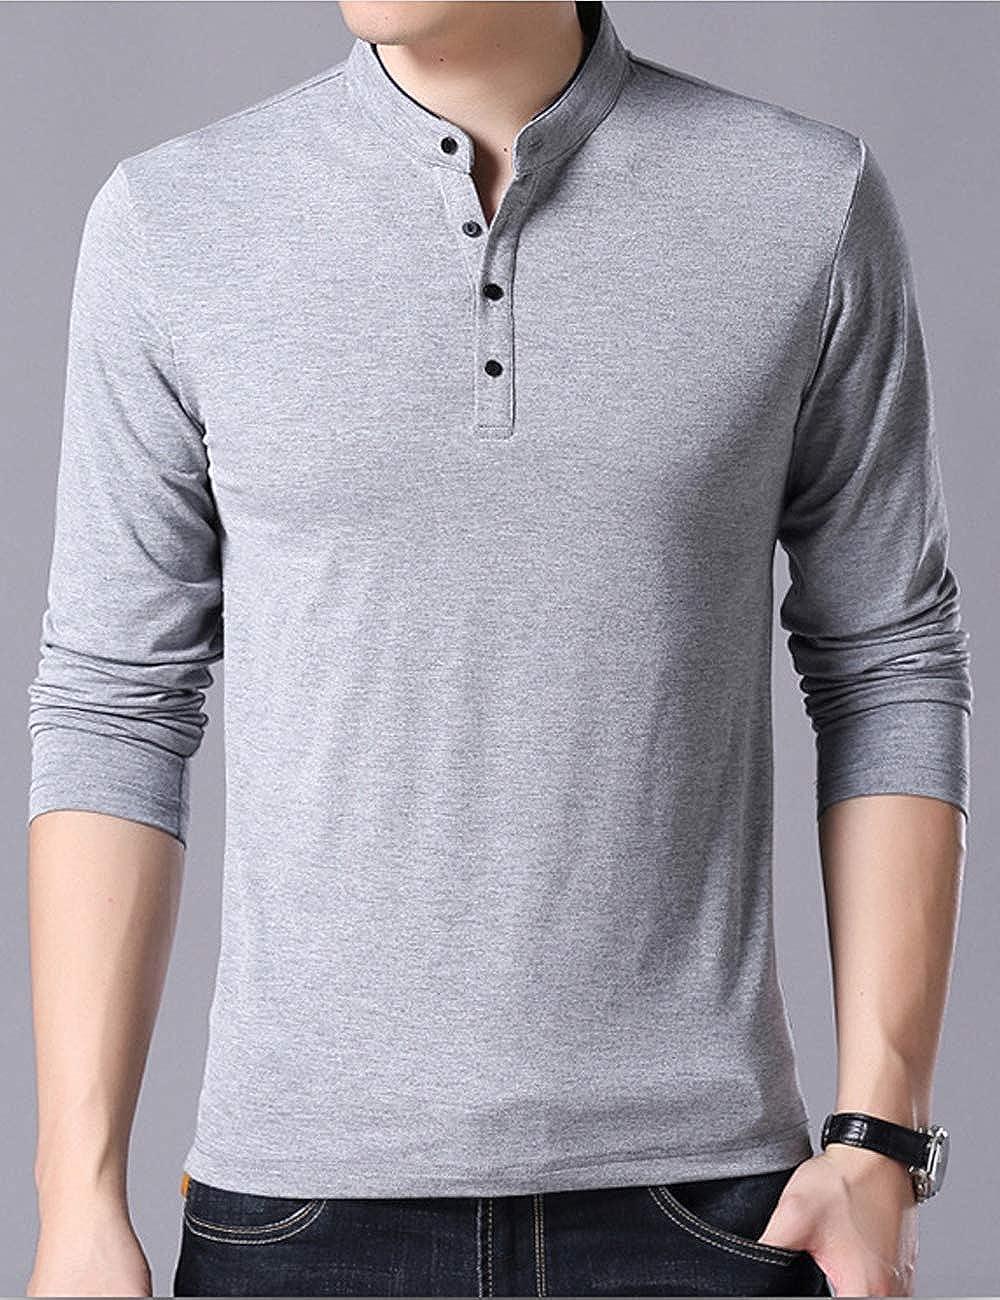 Hixiaohe Mens Casual Slim Fit Long Sleeve Cotton Henley T-Shirts Polo Fashion T-Shirts